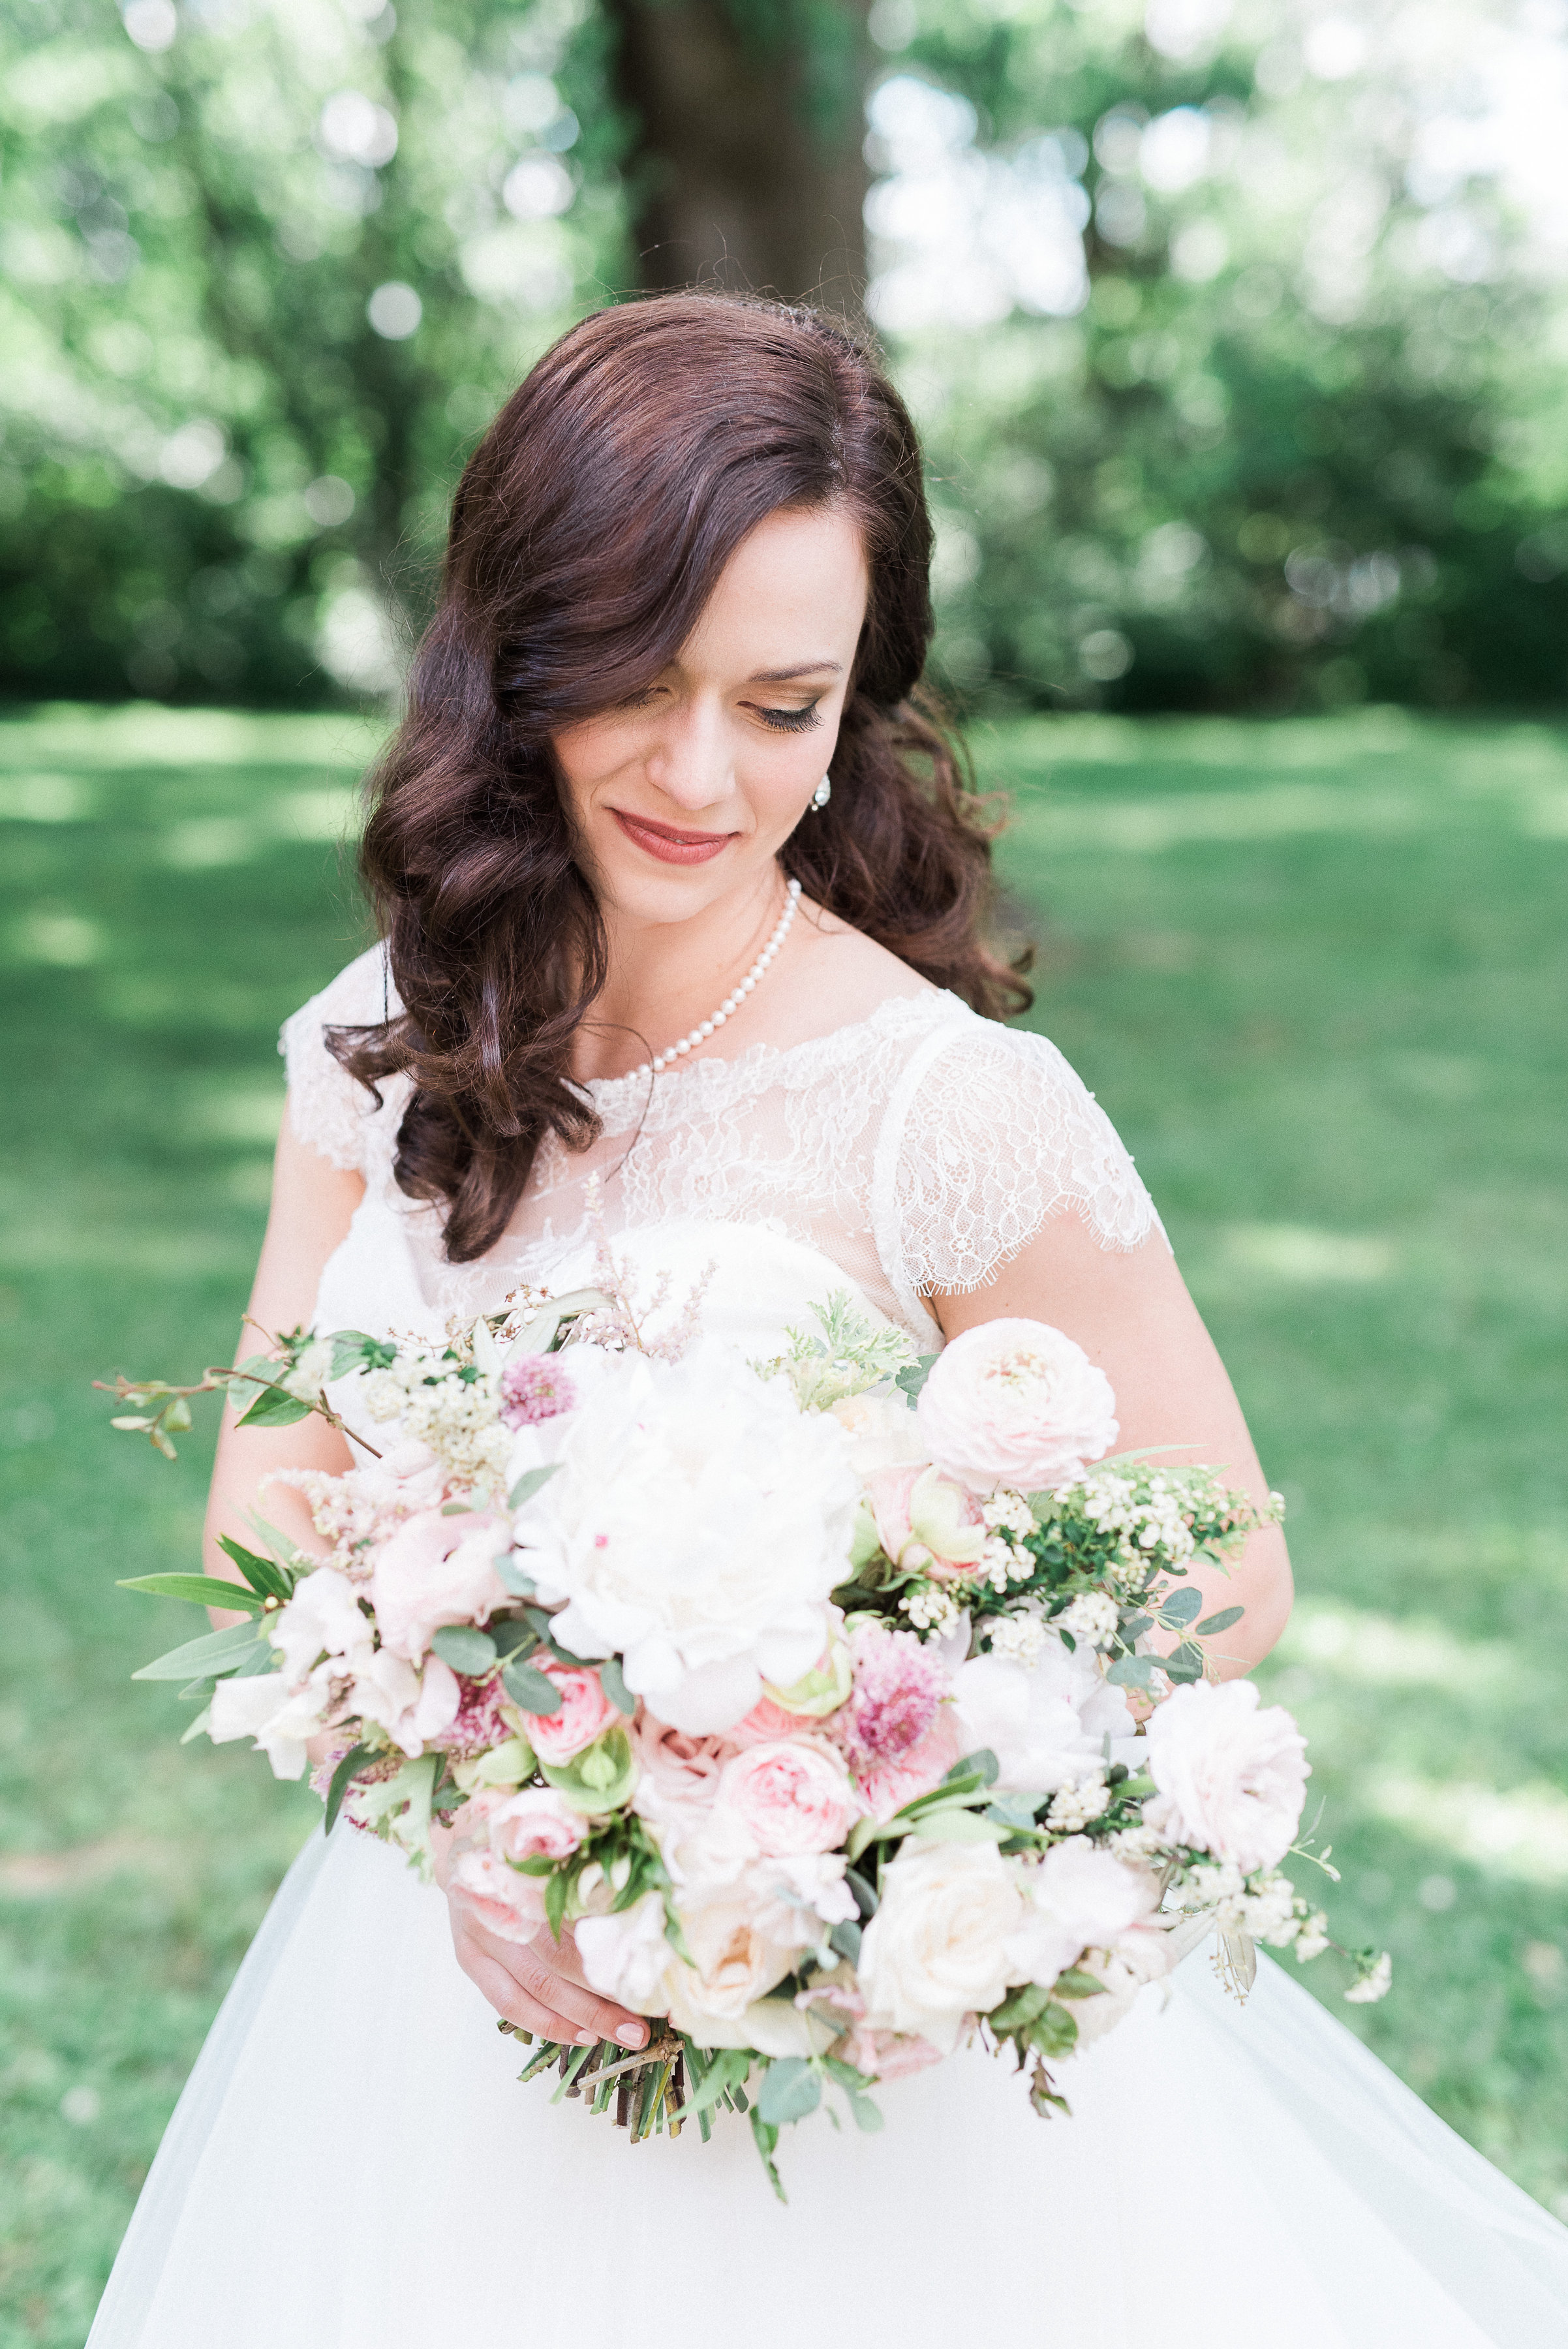 Garden inspired bridal bouquet with peonies, garden roses, and ranunculus // Nashville Wedding Florist